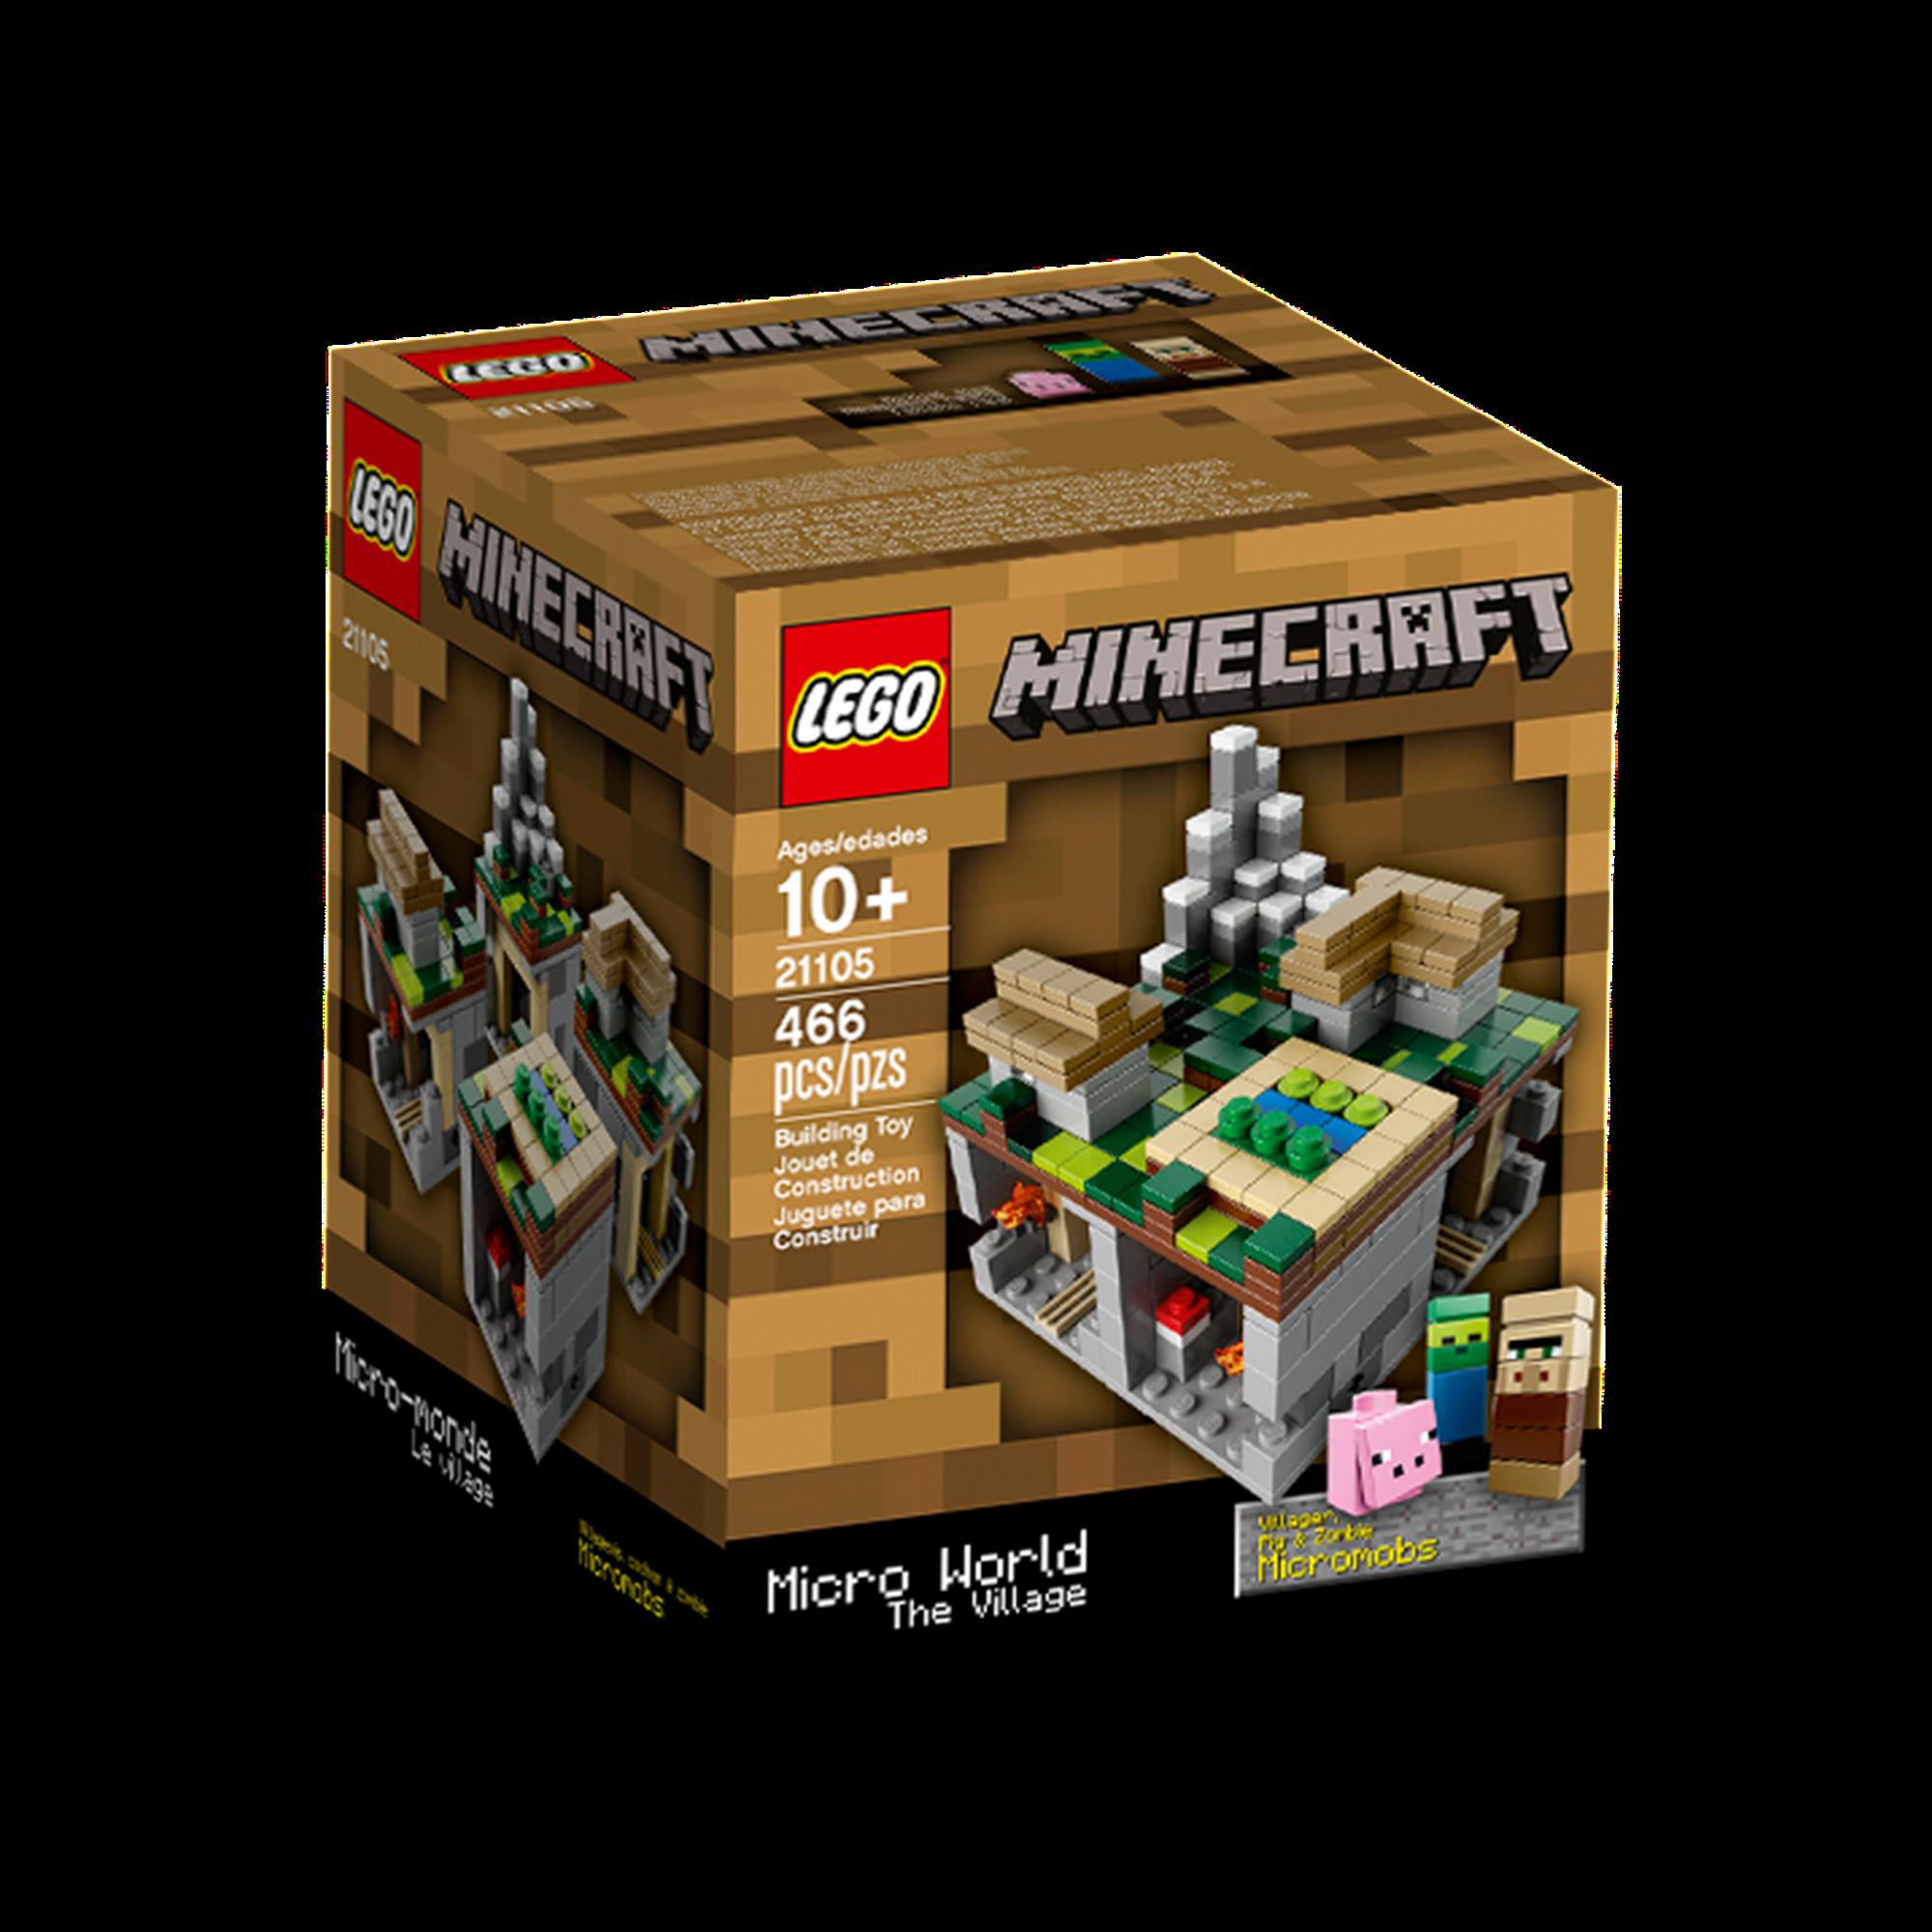 21105 The Village Brickipedia Fandom Powered By Wikia Lego 21134 Minecraft Waterfall Base